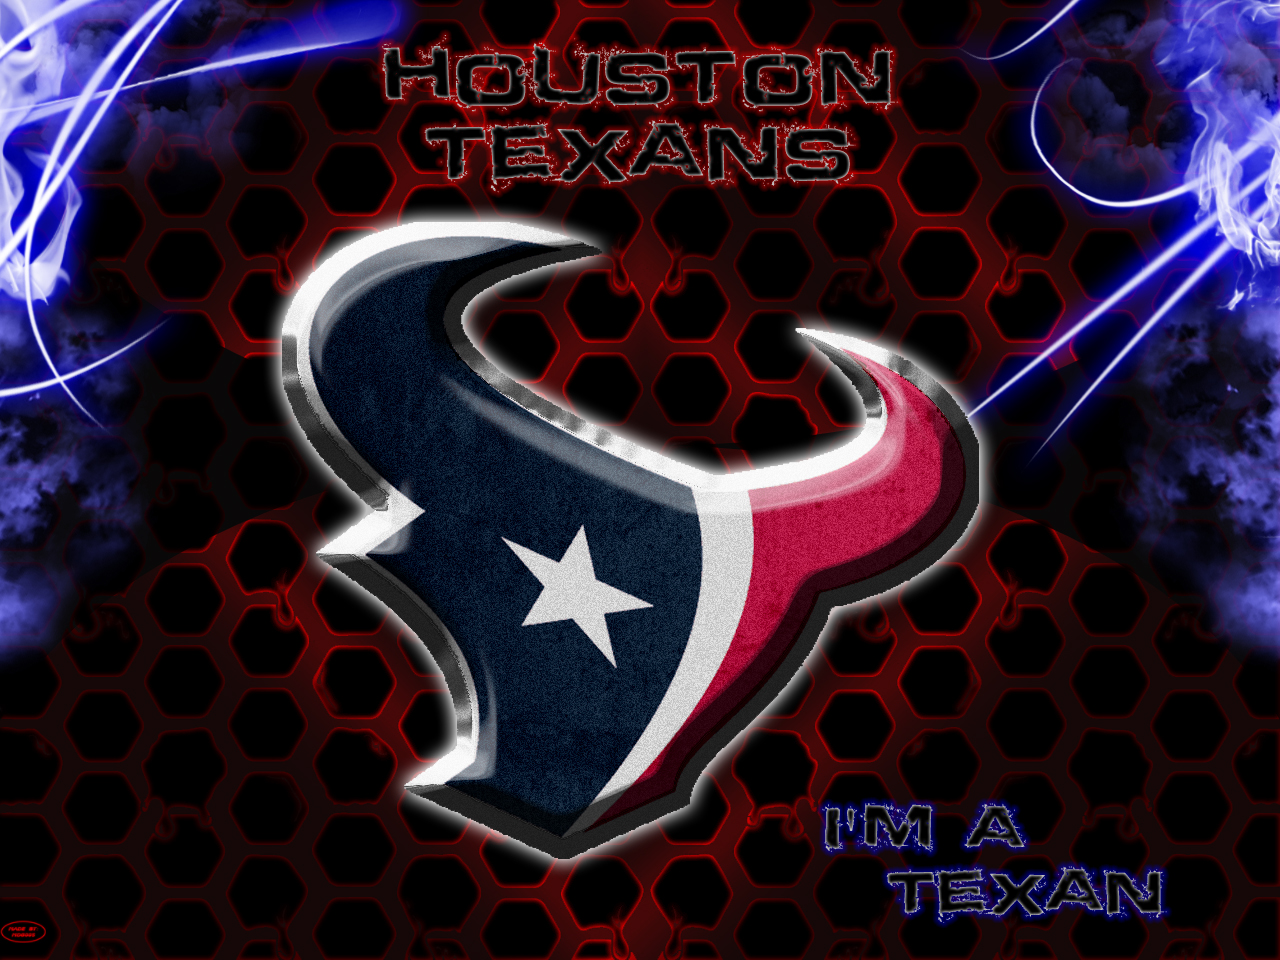 texans wallpaper im a texan jpg houston texans wallpaper houston 1280x960